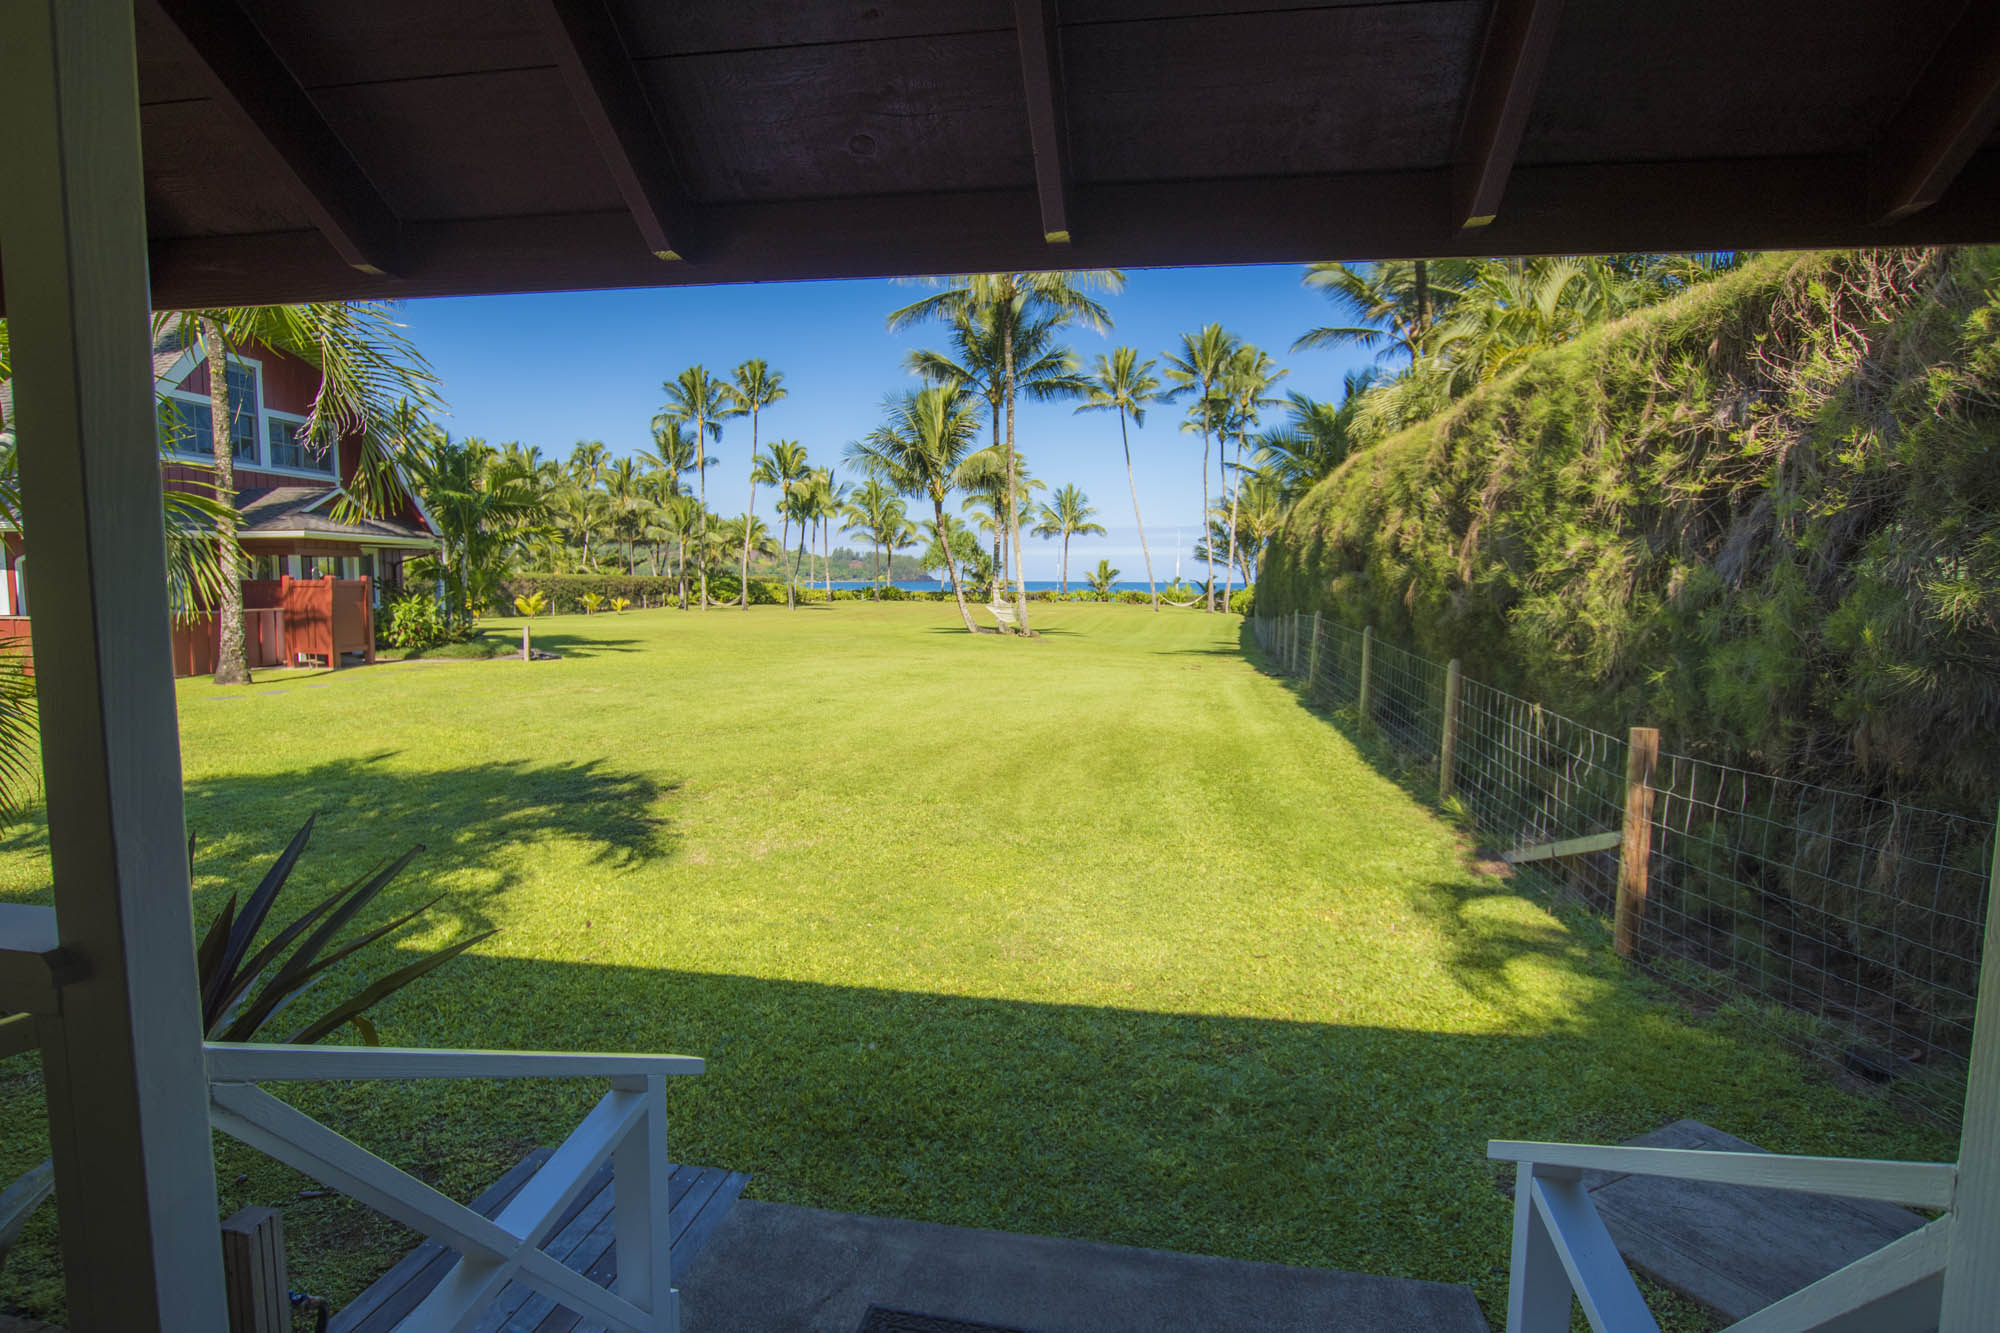 Kauai-217-Hanalei Bay27